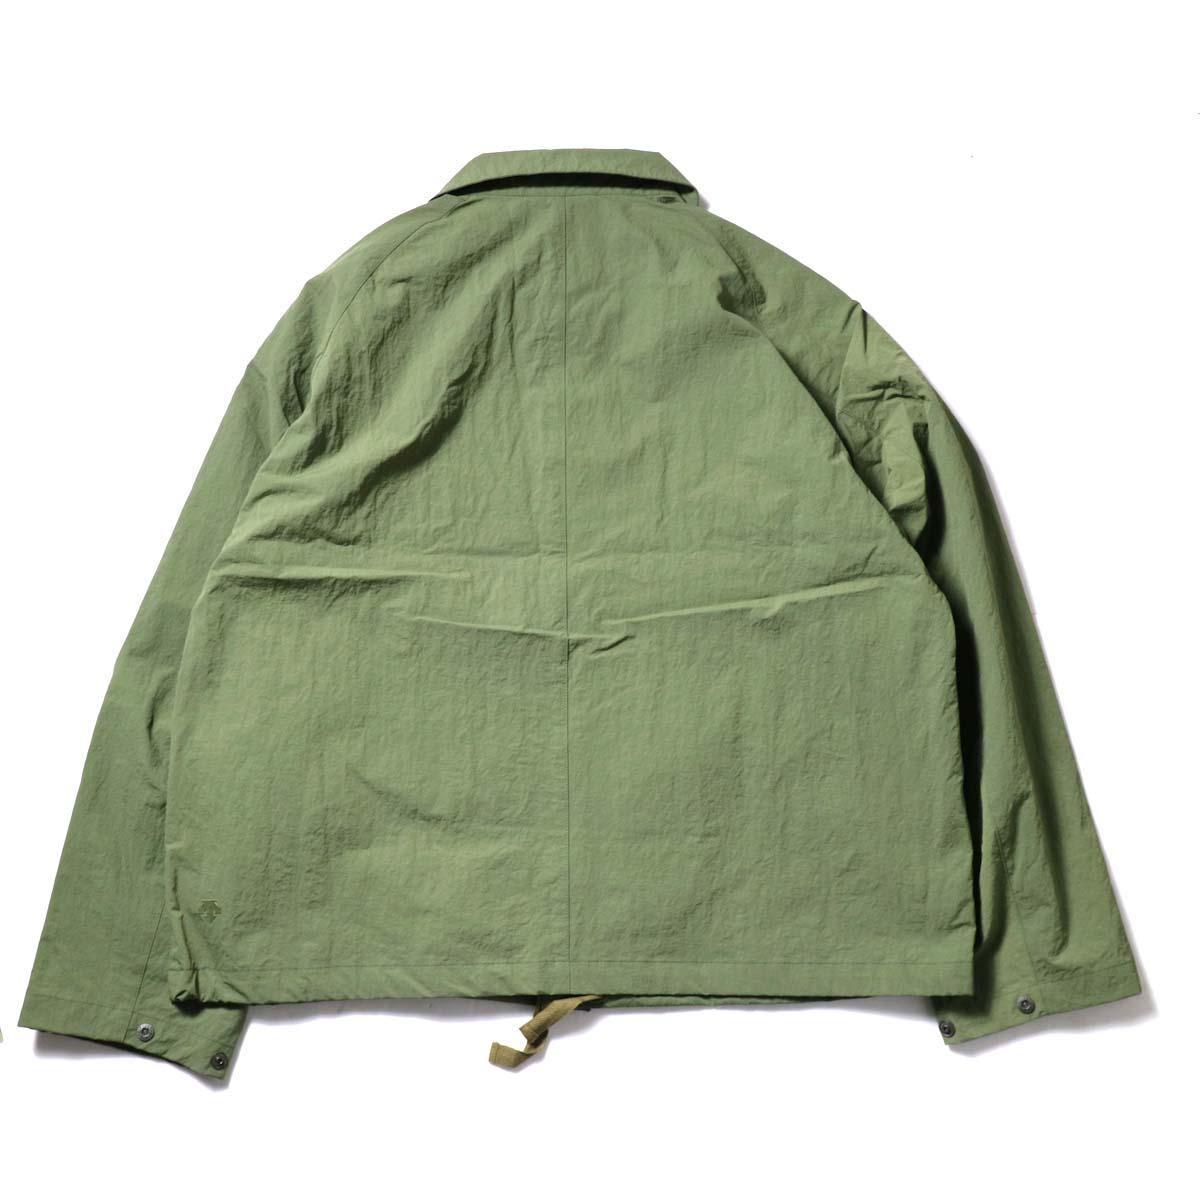 DESCENTE ddd / SWING COACH JACKET (Khaki)背面